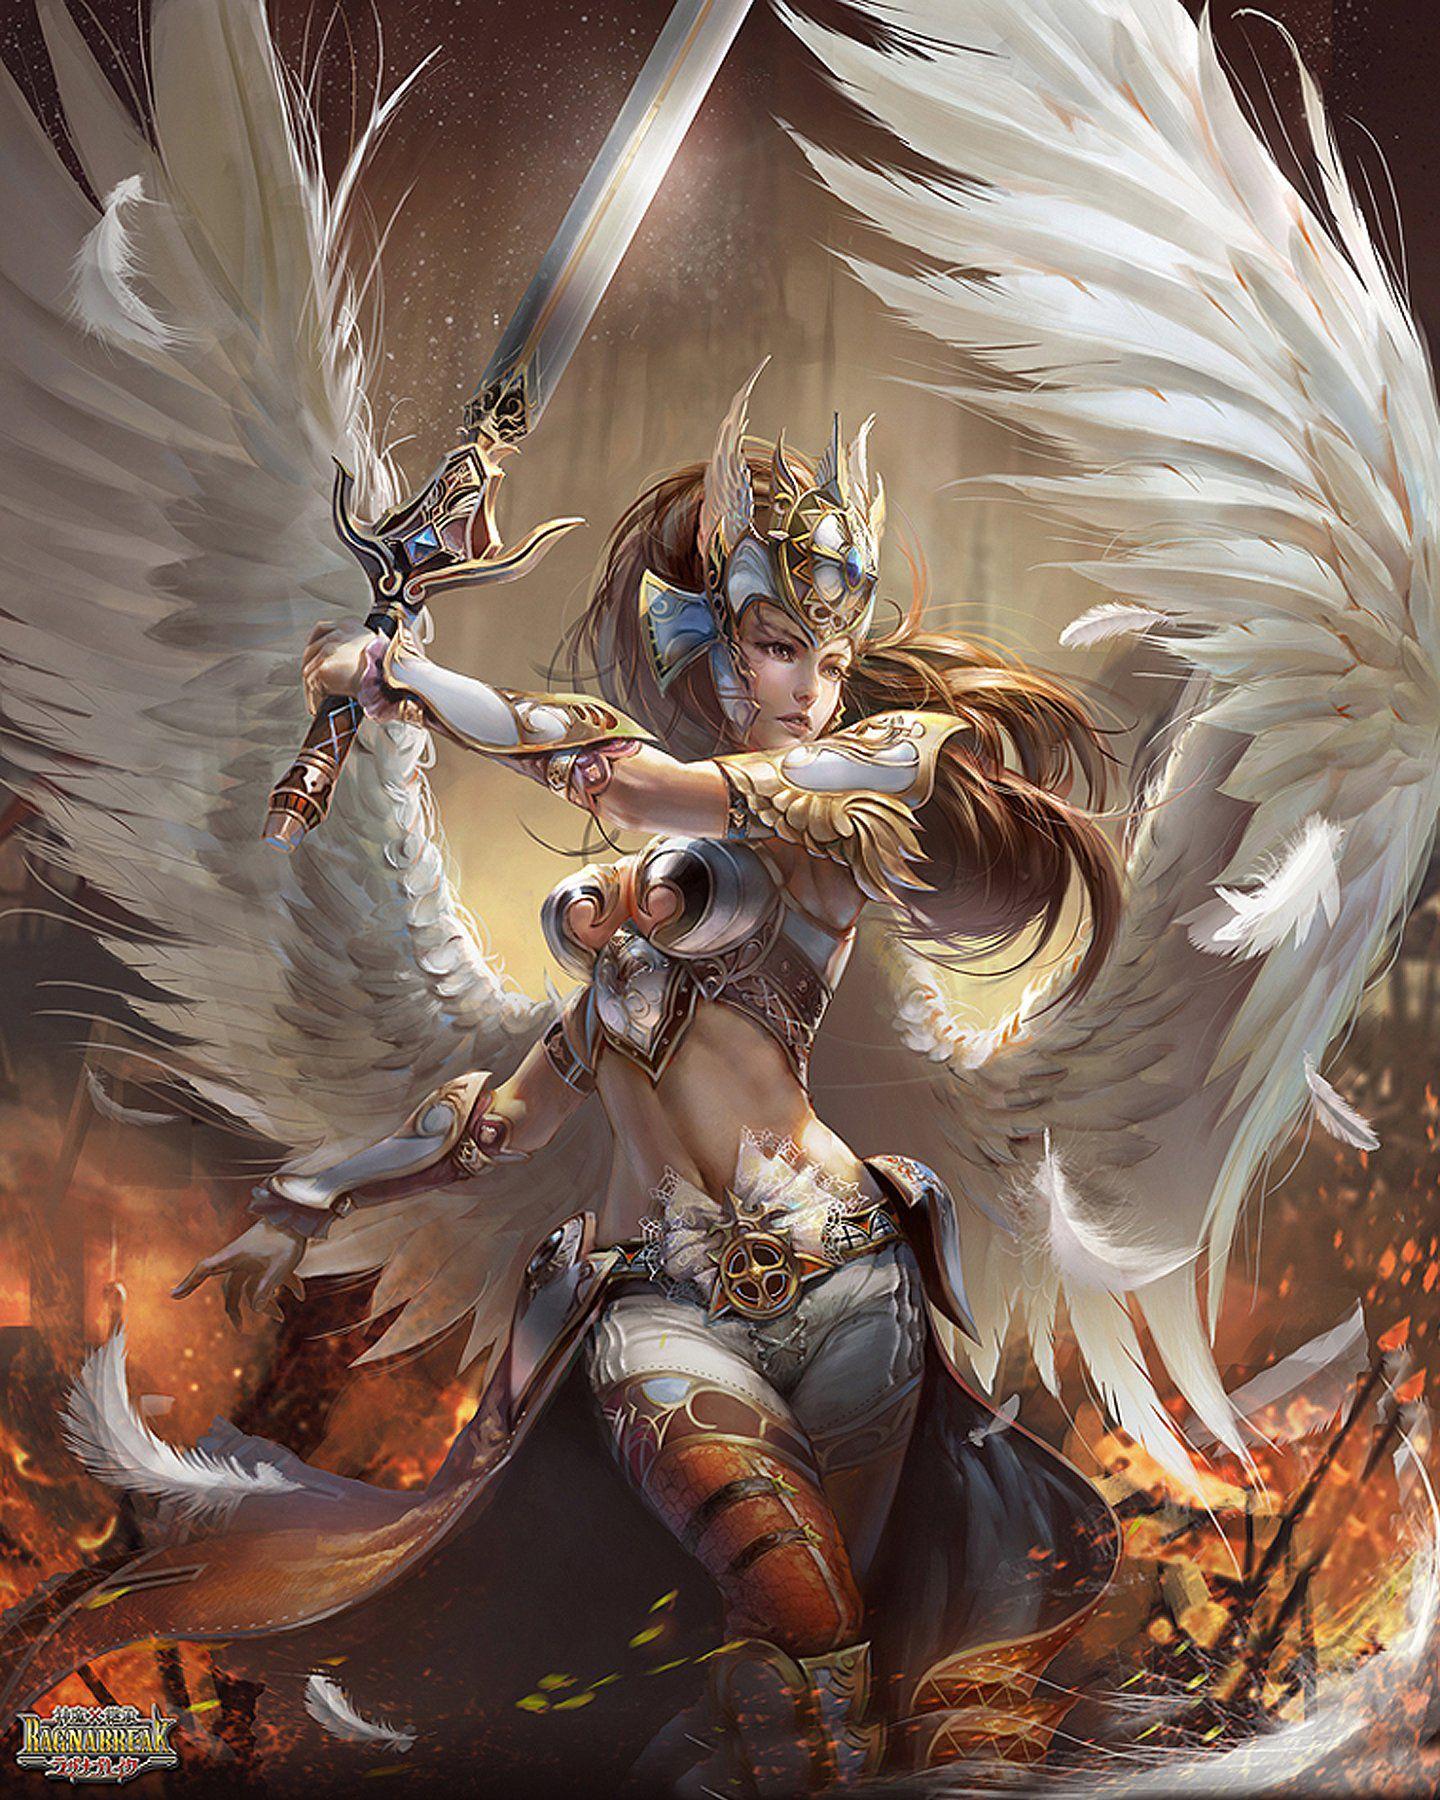 Beautiful Game Wings Girls Holding Sword Hd Wallpapers Jpg 1440 1800 Fantasy Art Game Illustration Fantasy Artwork